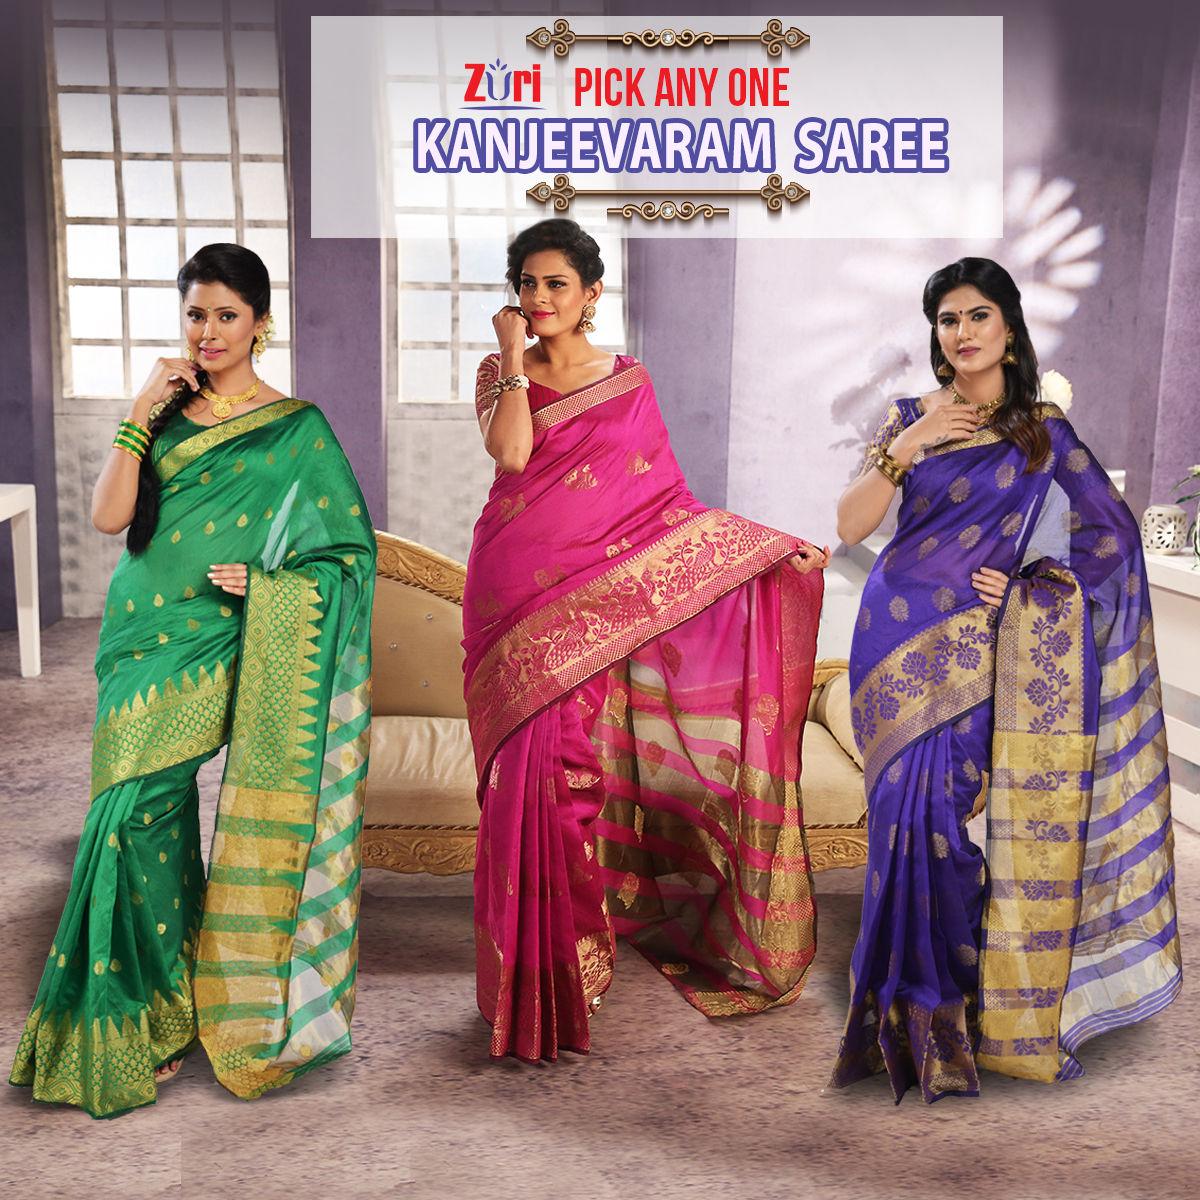 8df86d5f3eb Buy Pick Any One Kanjeevaram Silk Saree by Zuri (KSS5) Online at Best Price  in India on Naaptol.com